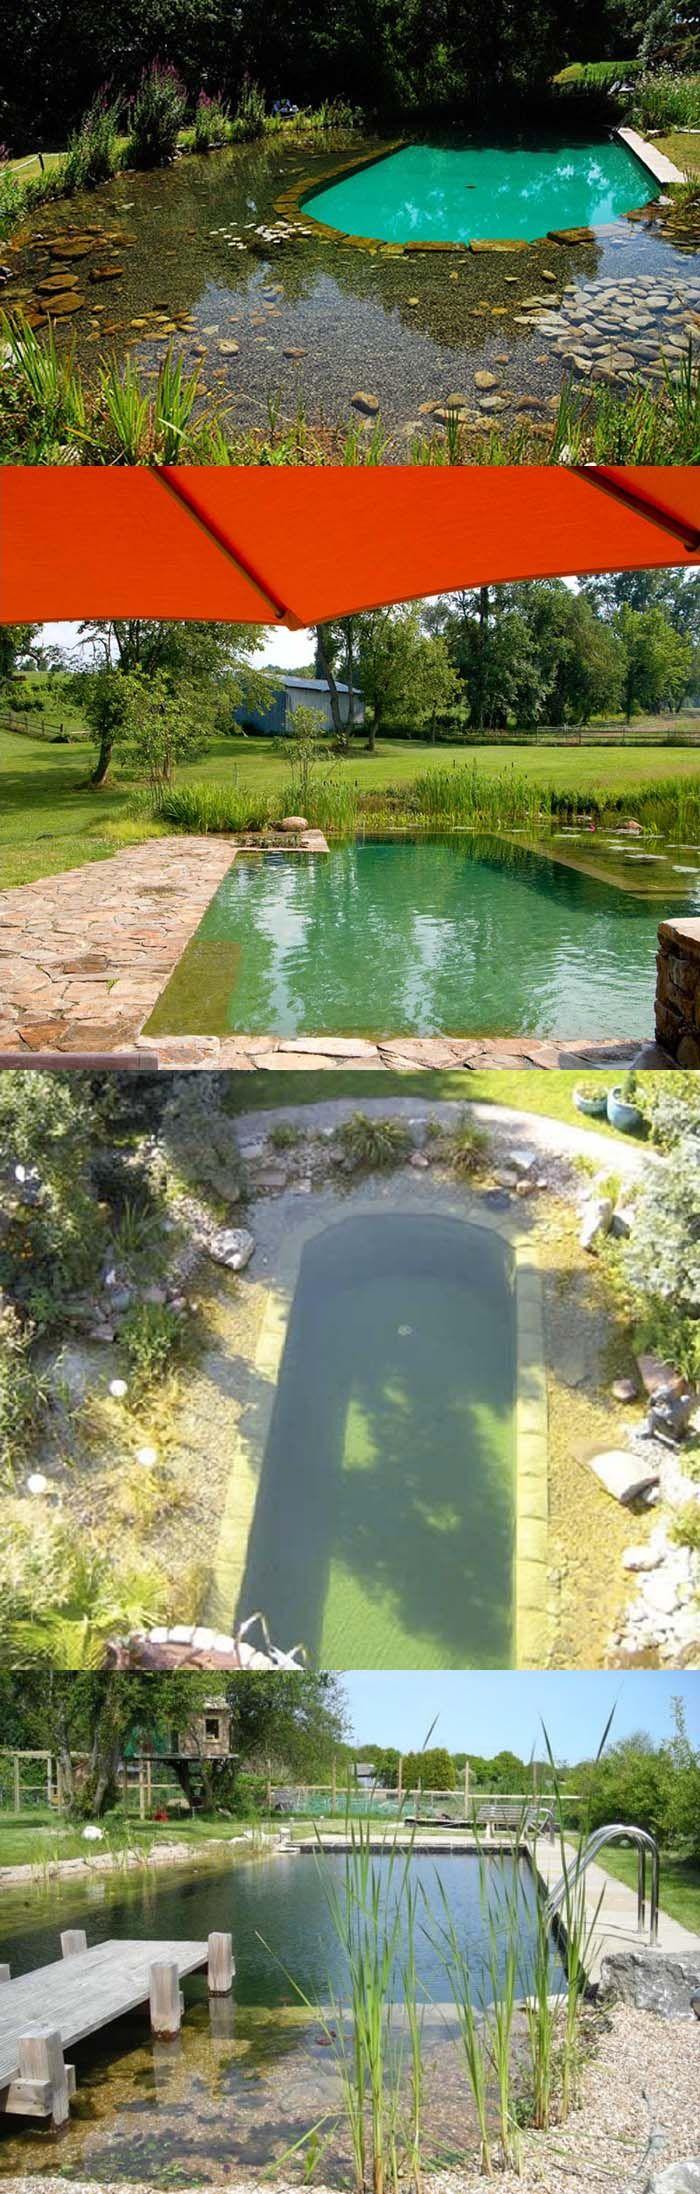 natural pool - Pinterest pic picks by RetoxMagazine.com